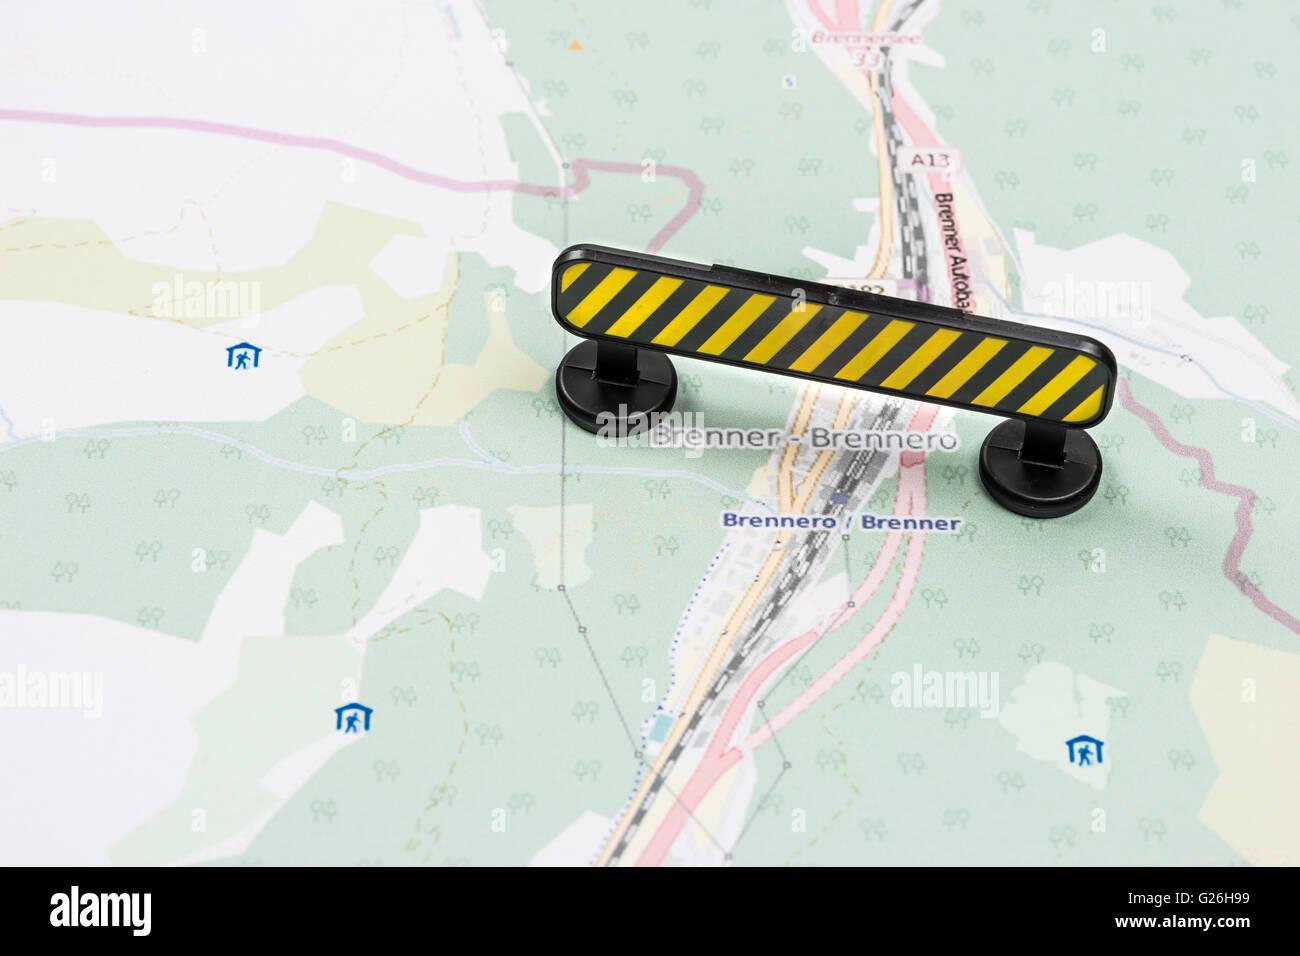 Crise de migrants de l'UE frontaliers italiens autrichiens blocus jaune Photo Stock